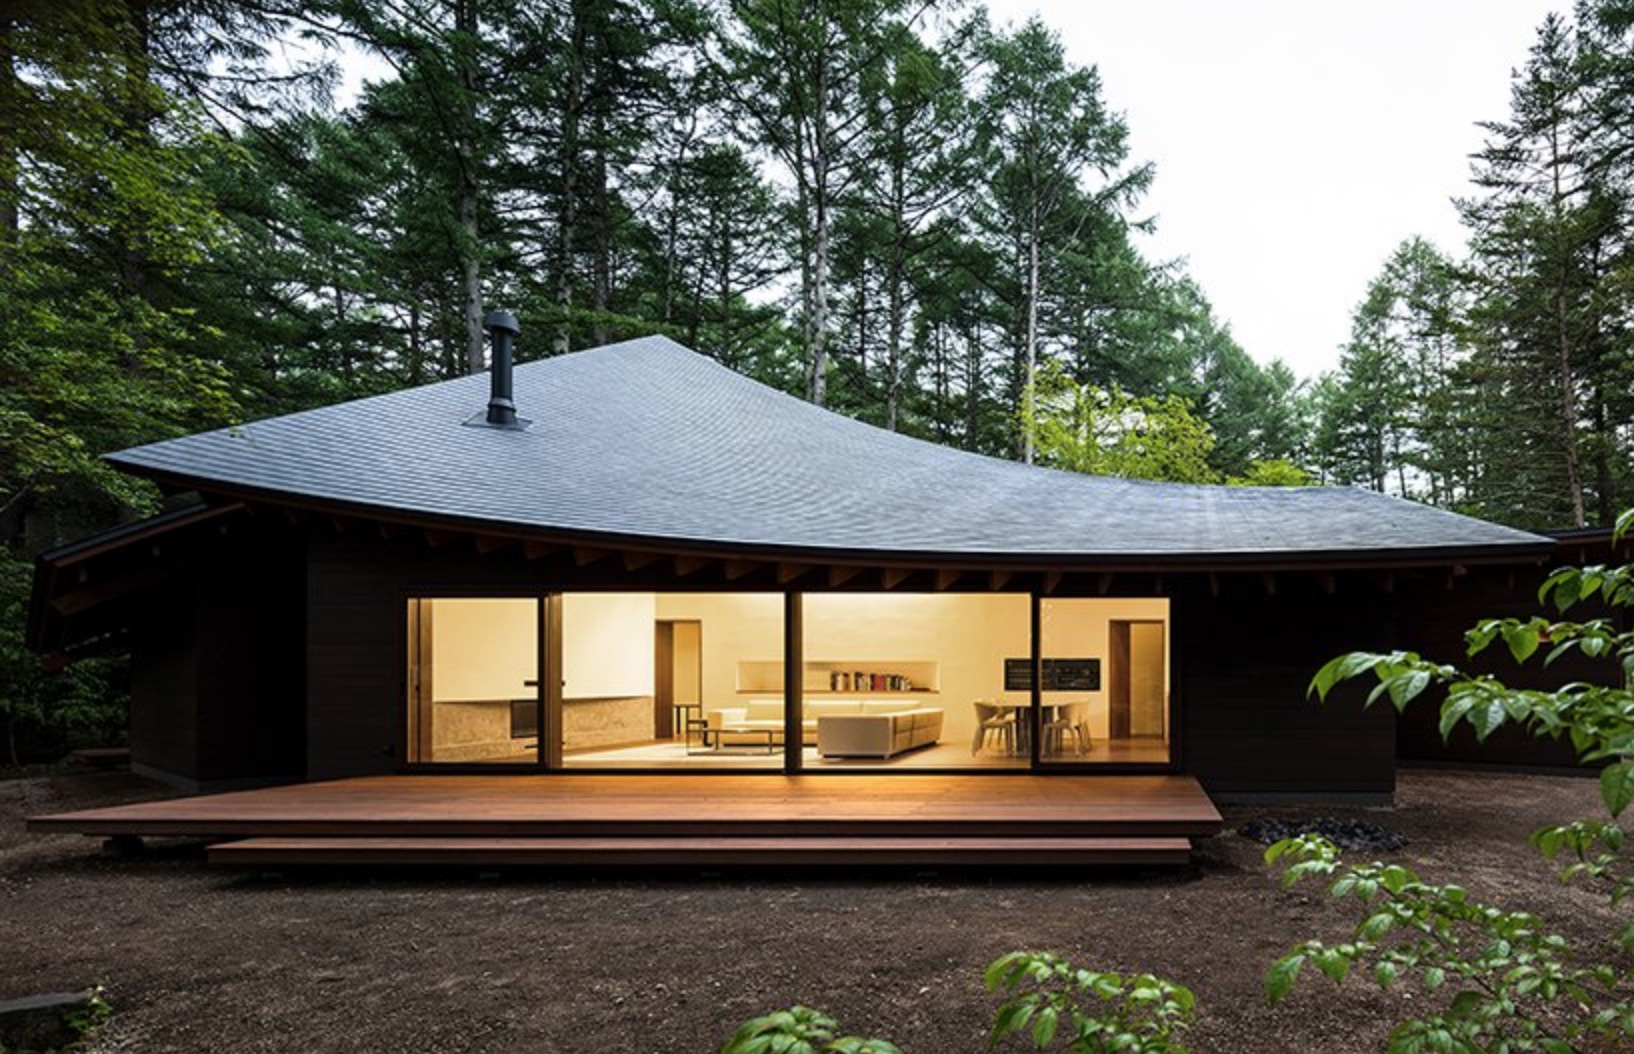 Modern Japanese house in the woods looks like fallen leaves